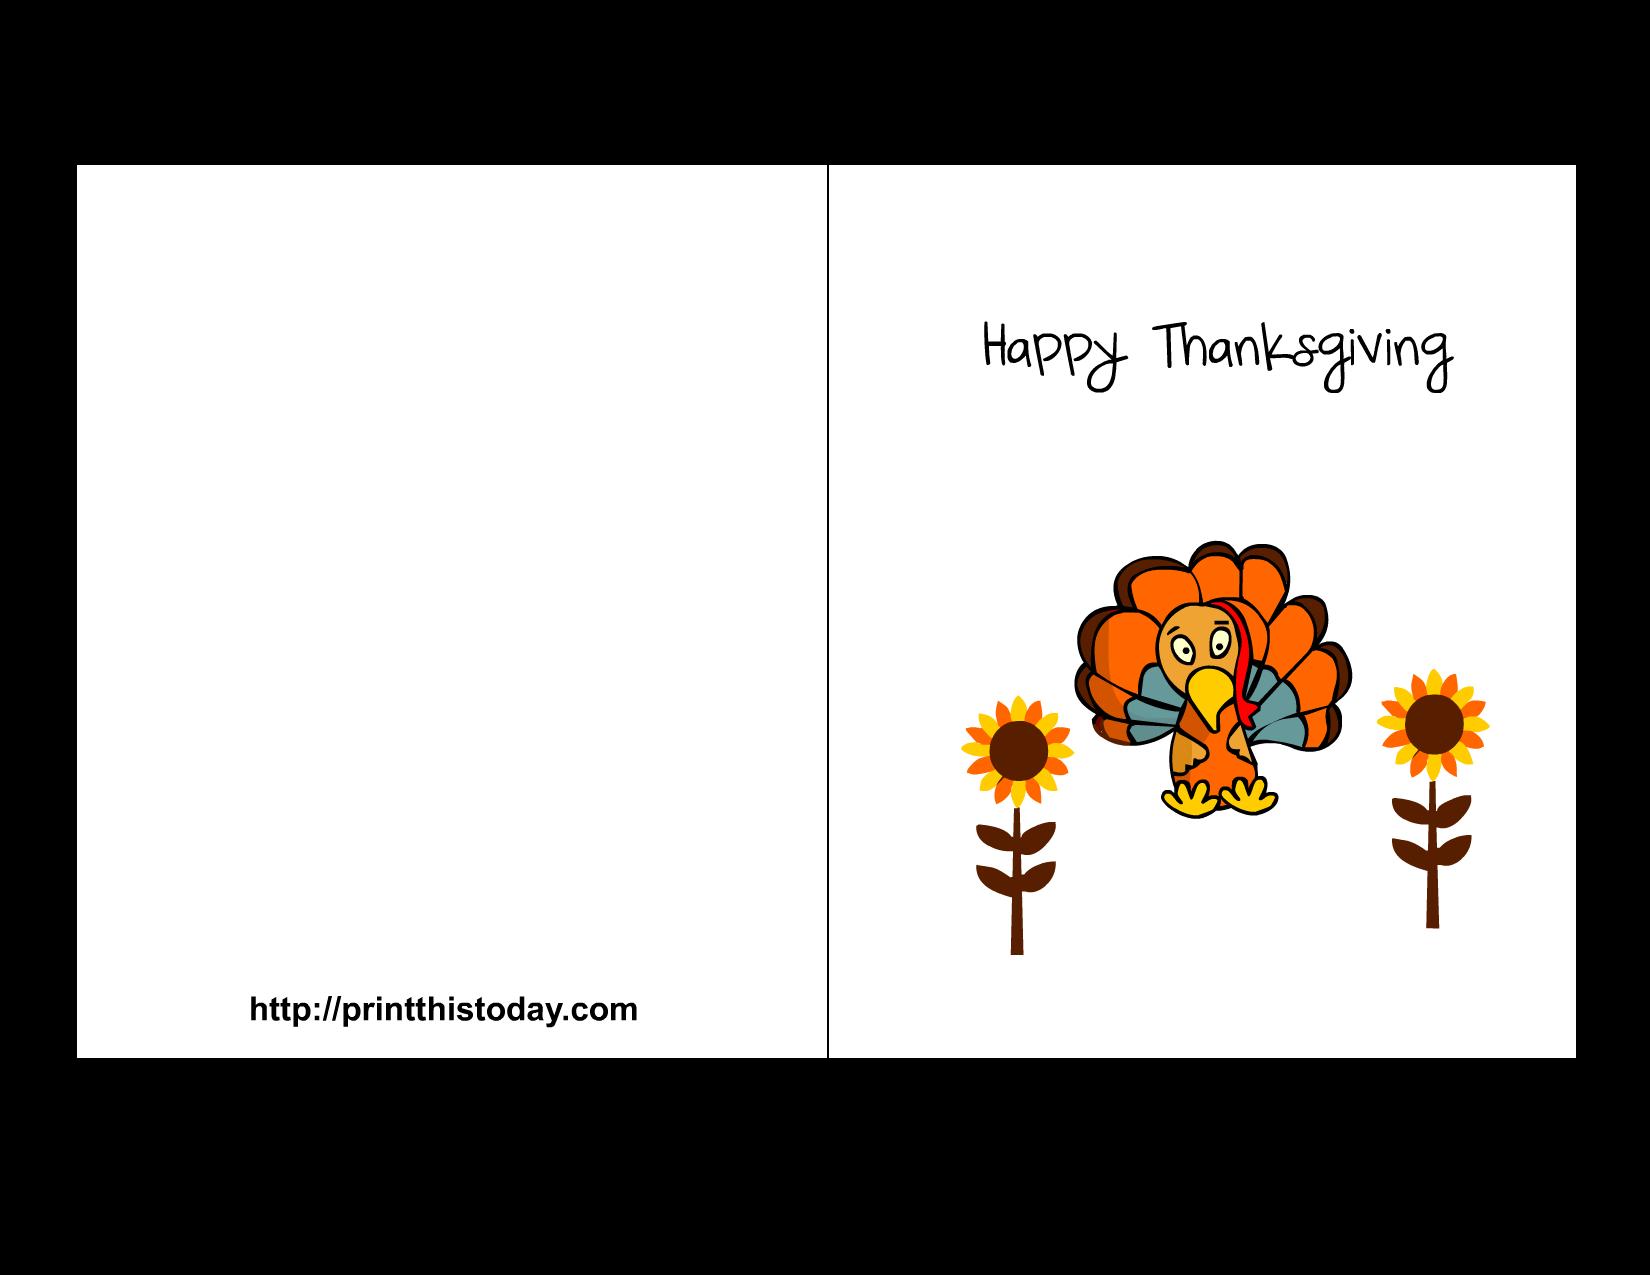 free printable thanksgiving cards. Black Bedroom Furniture Sets. Home Design Ideas